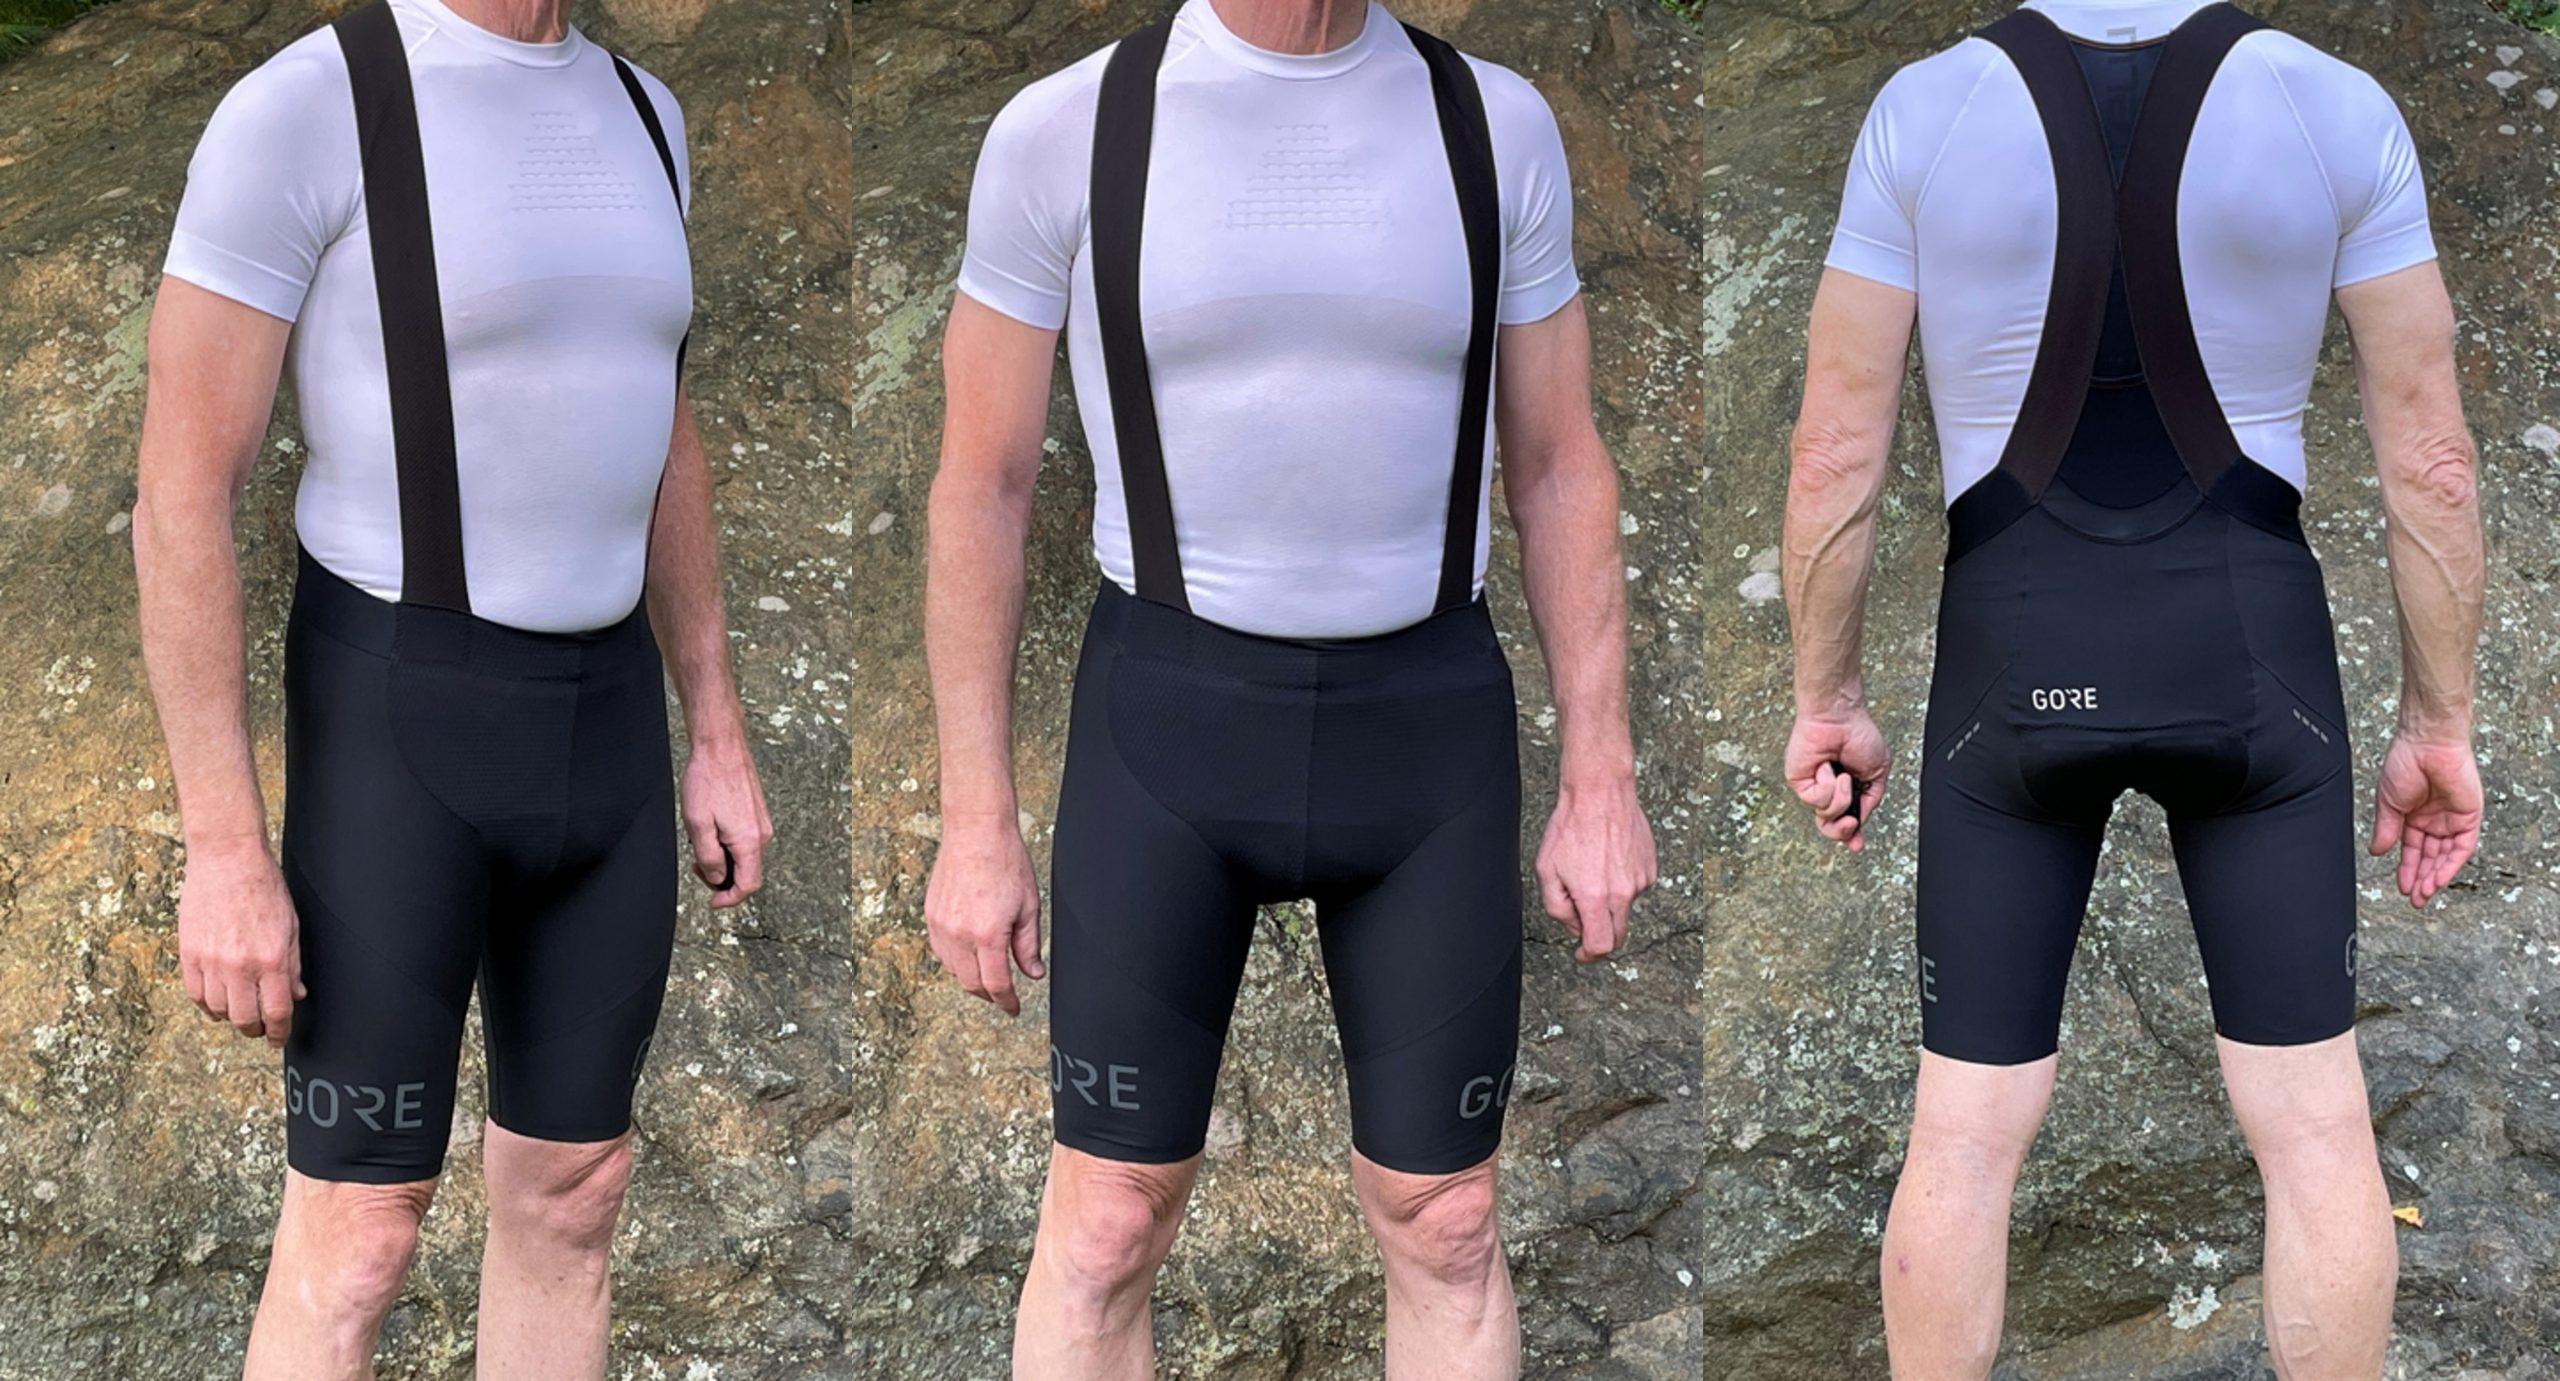 Gore C7 Long Distance Bib Shorts